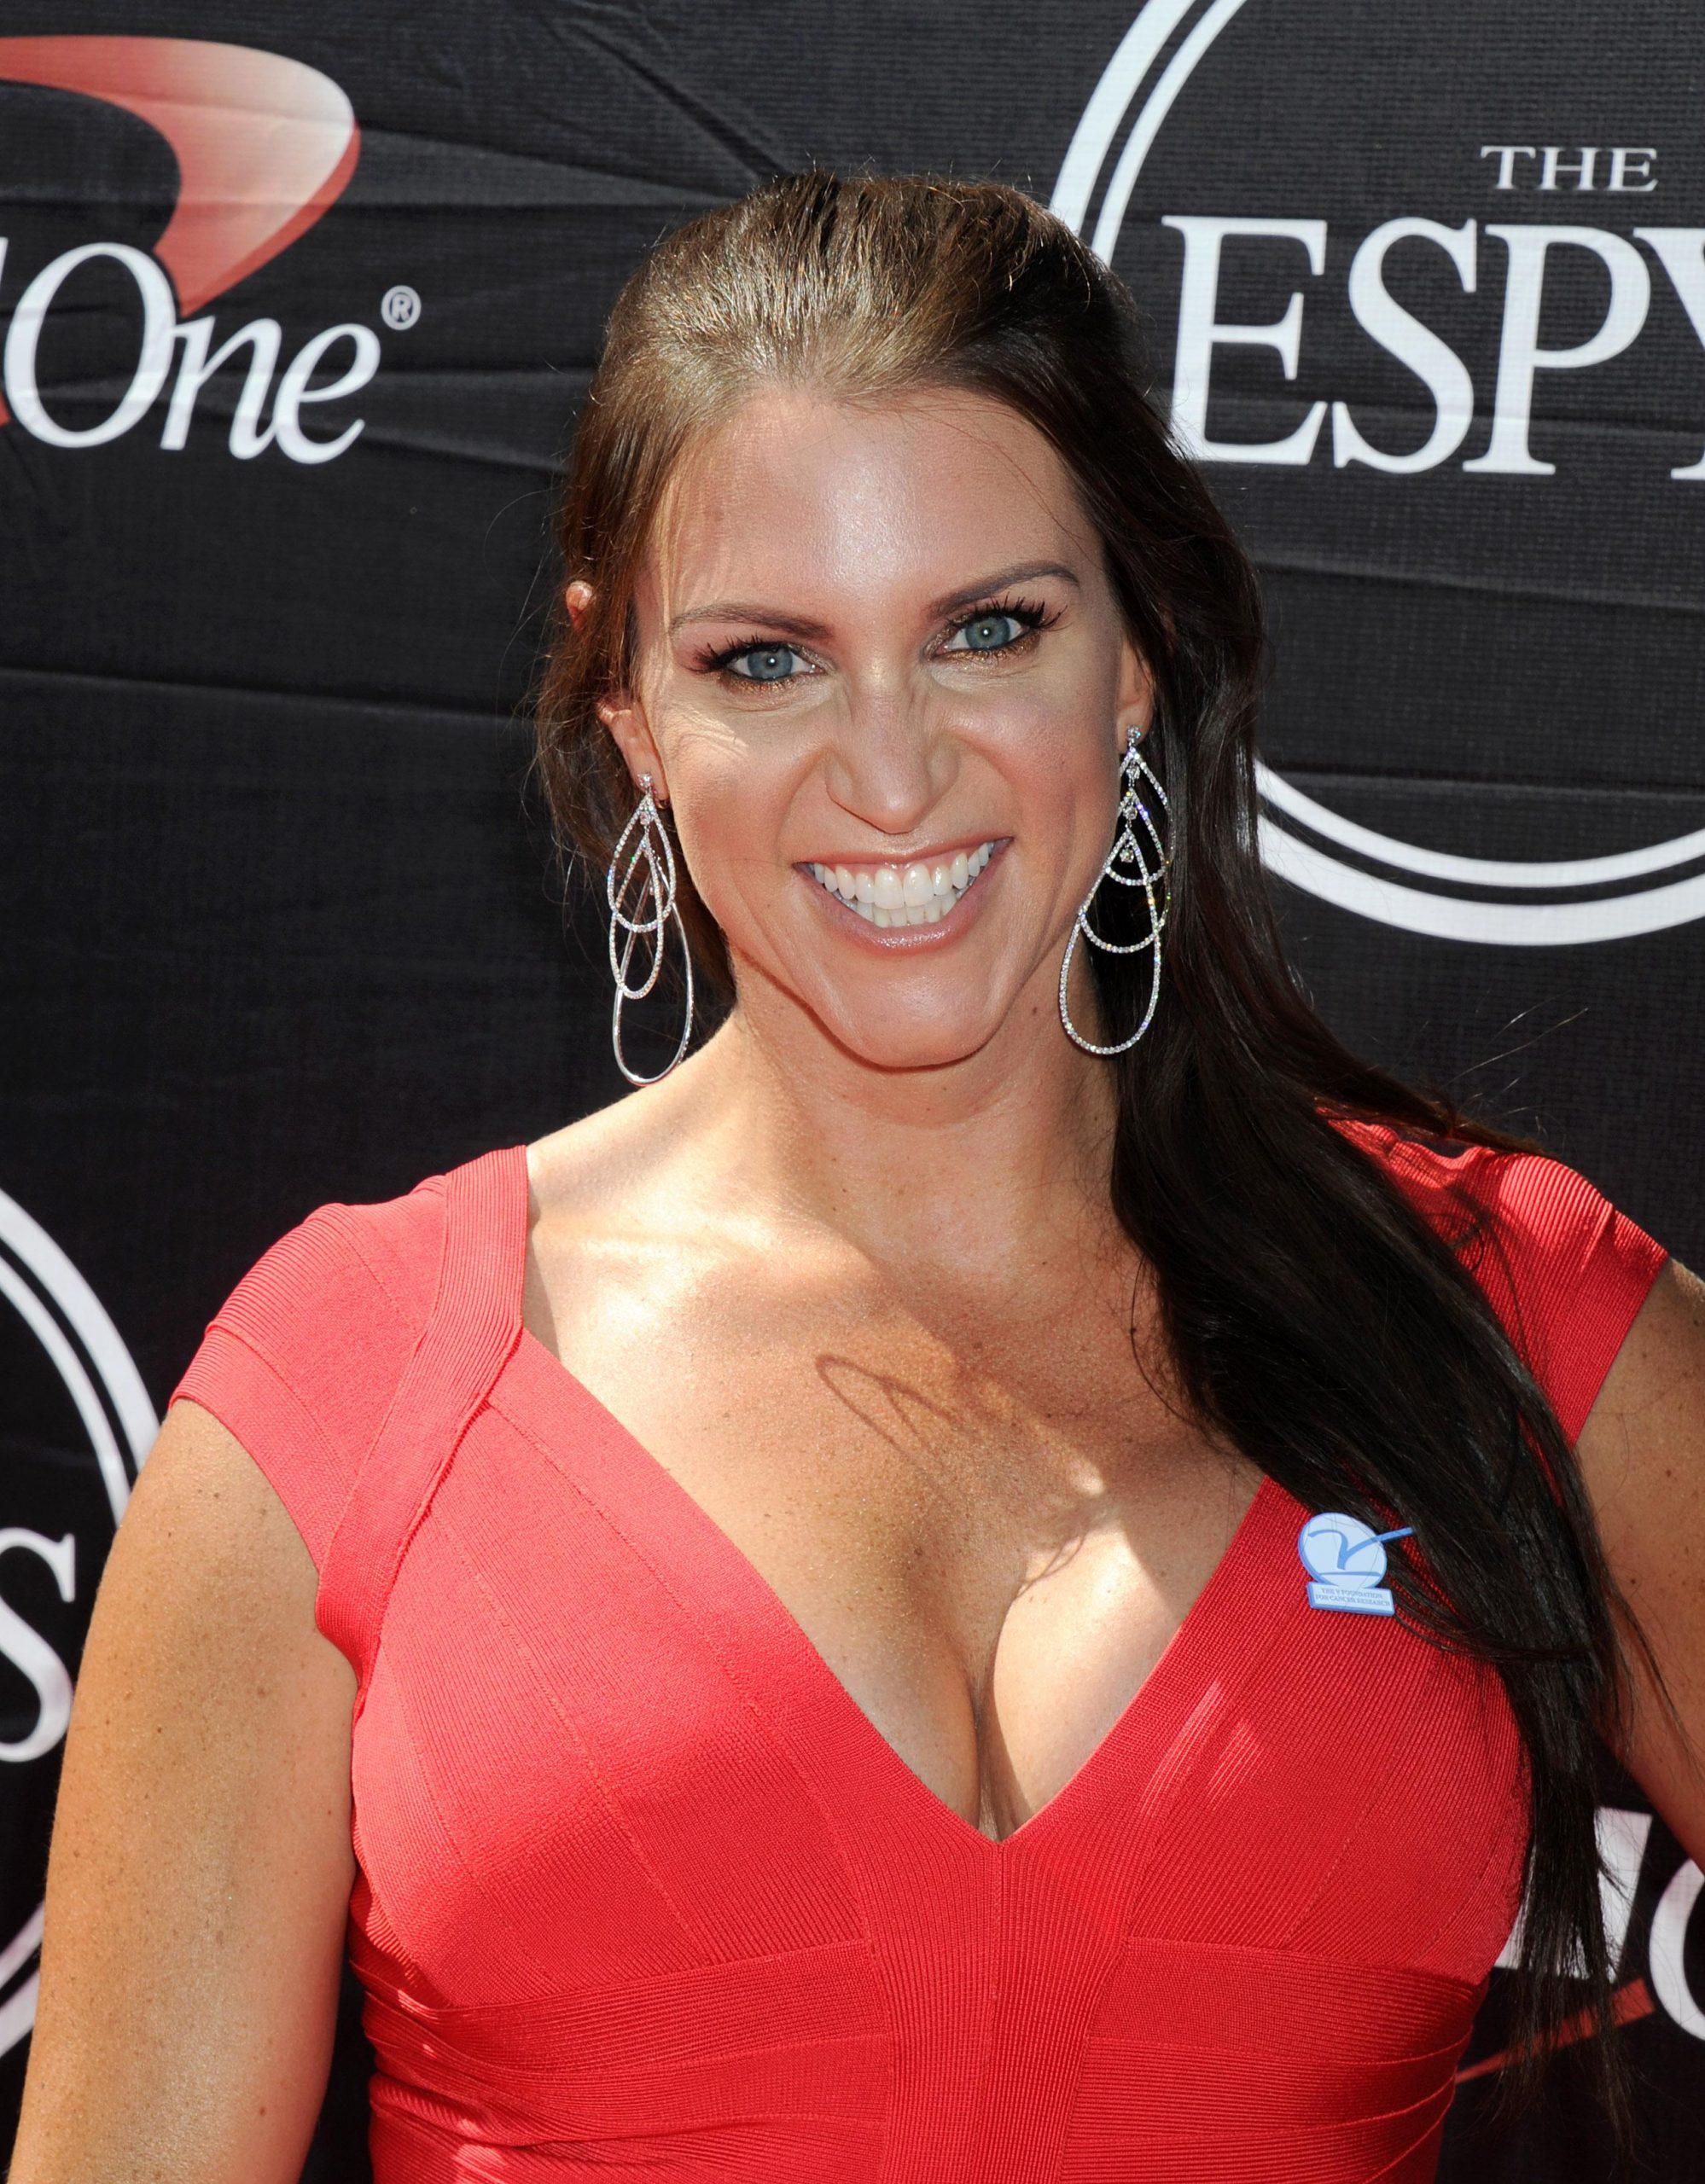 Stephanie McMahon hot look